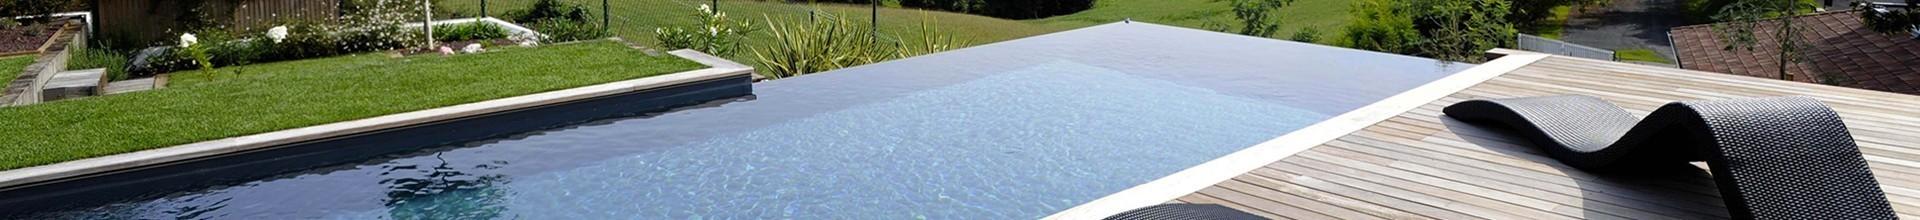 Constructeur piscine discount Bretagne